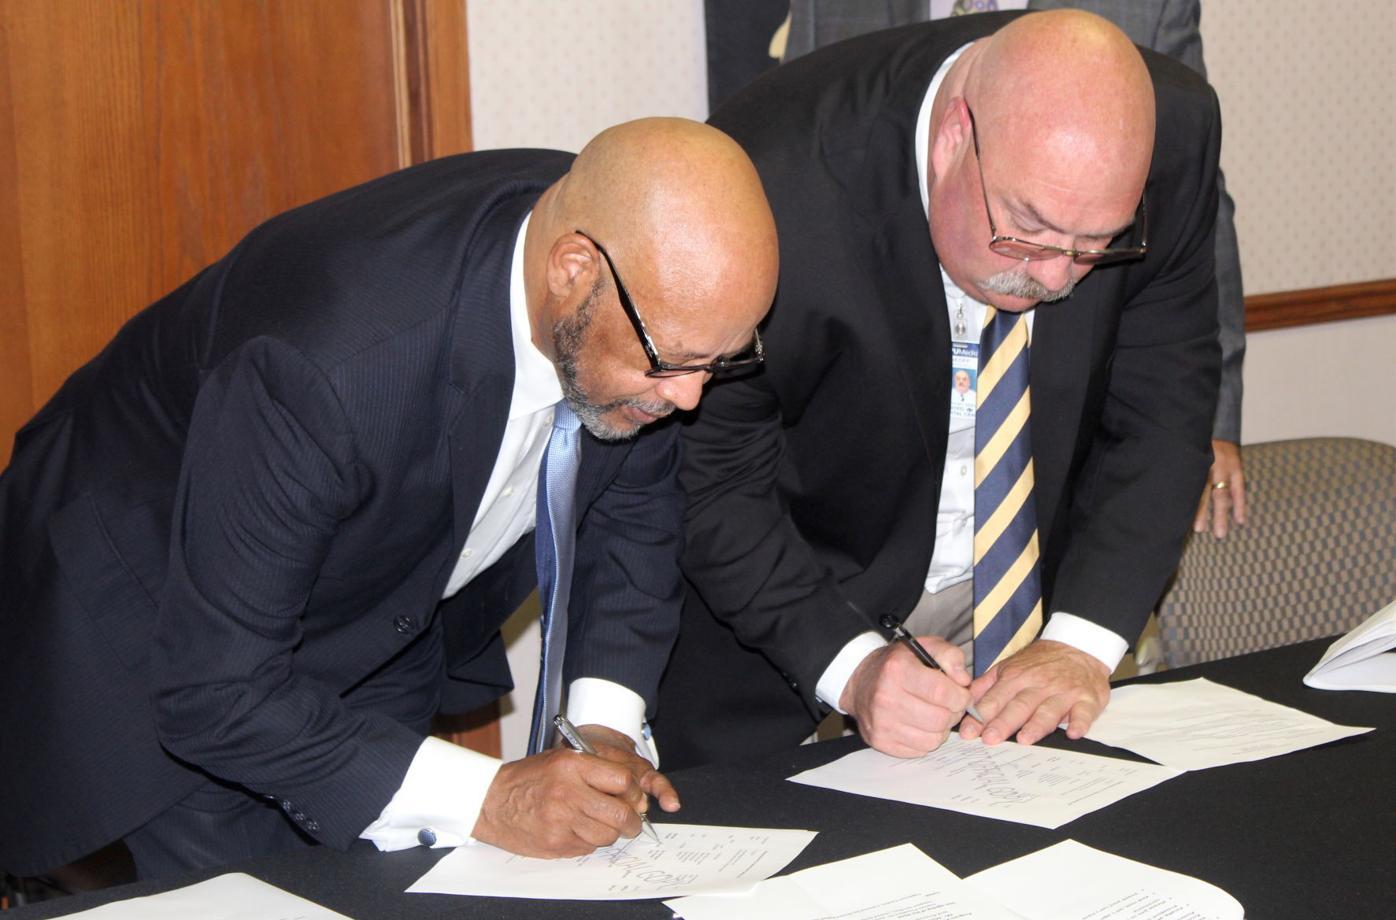 Mock Signing